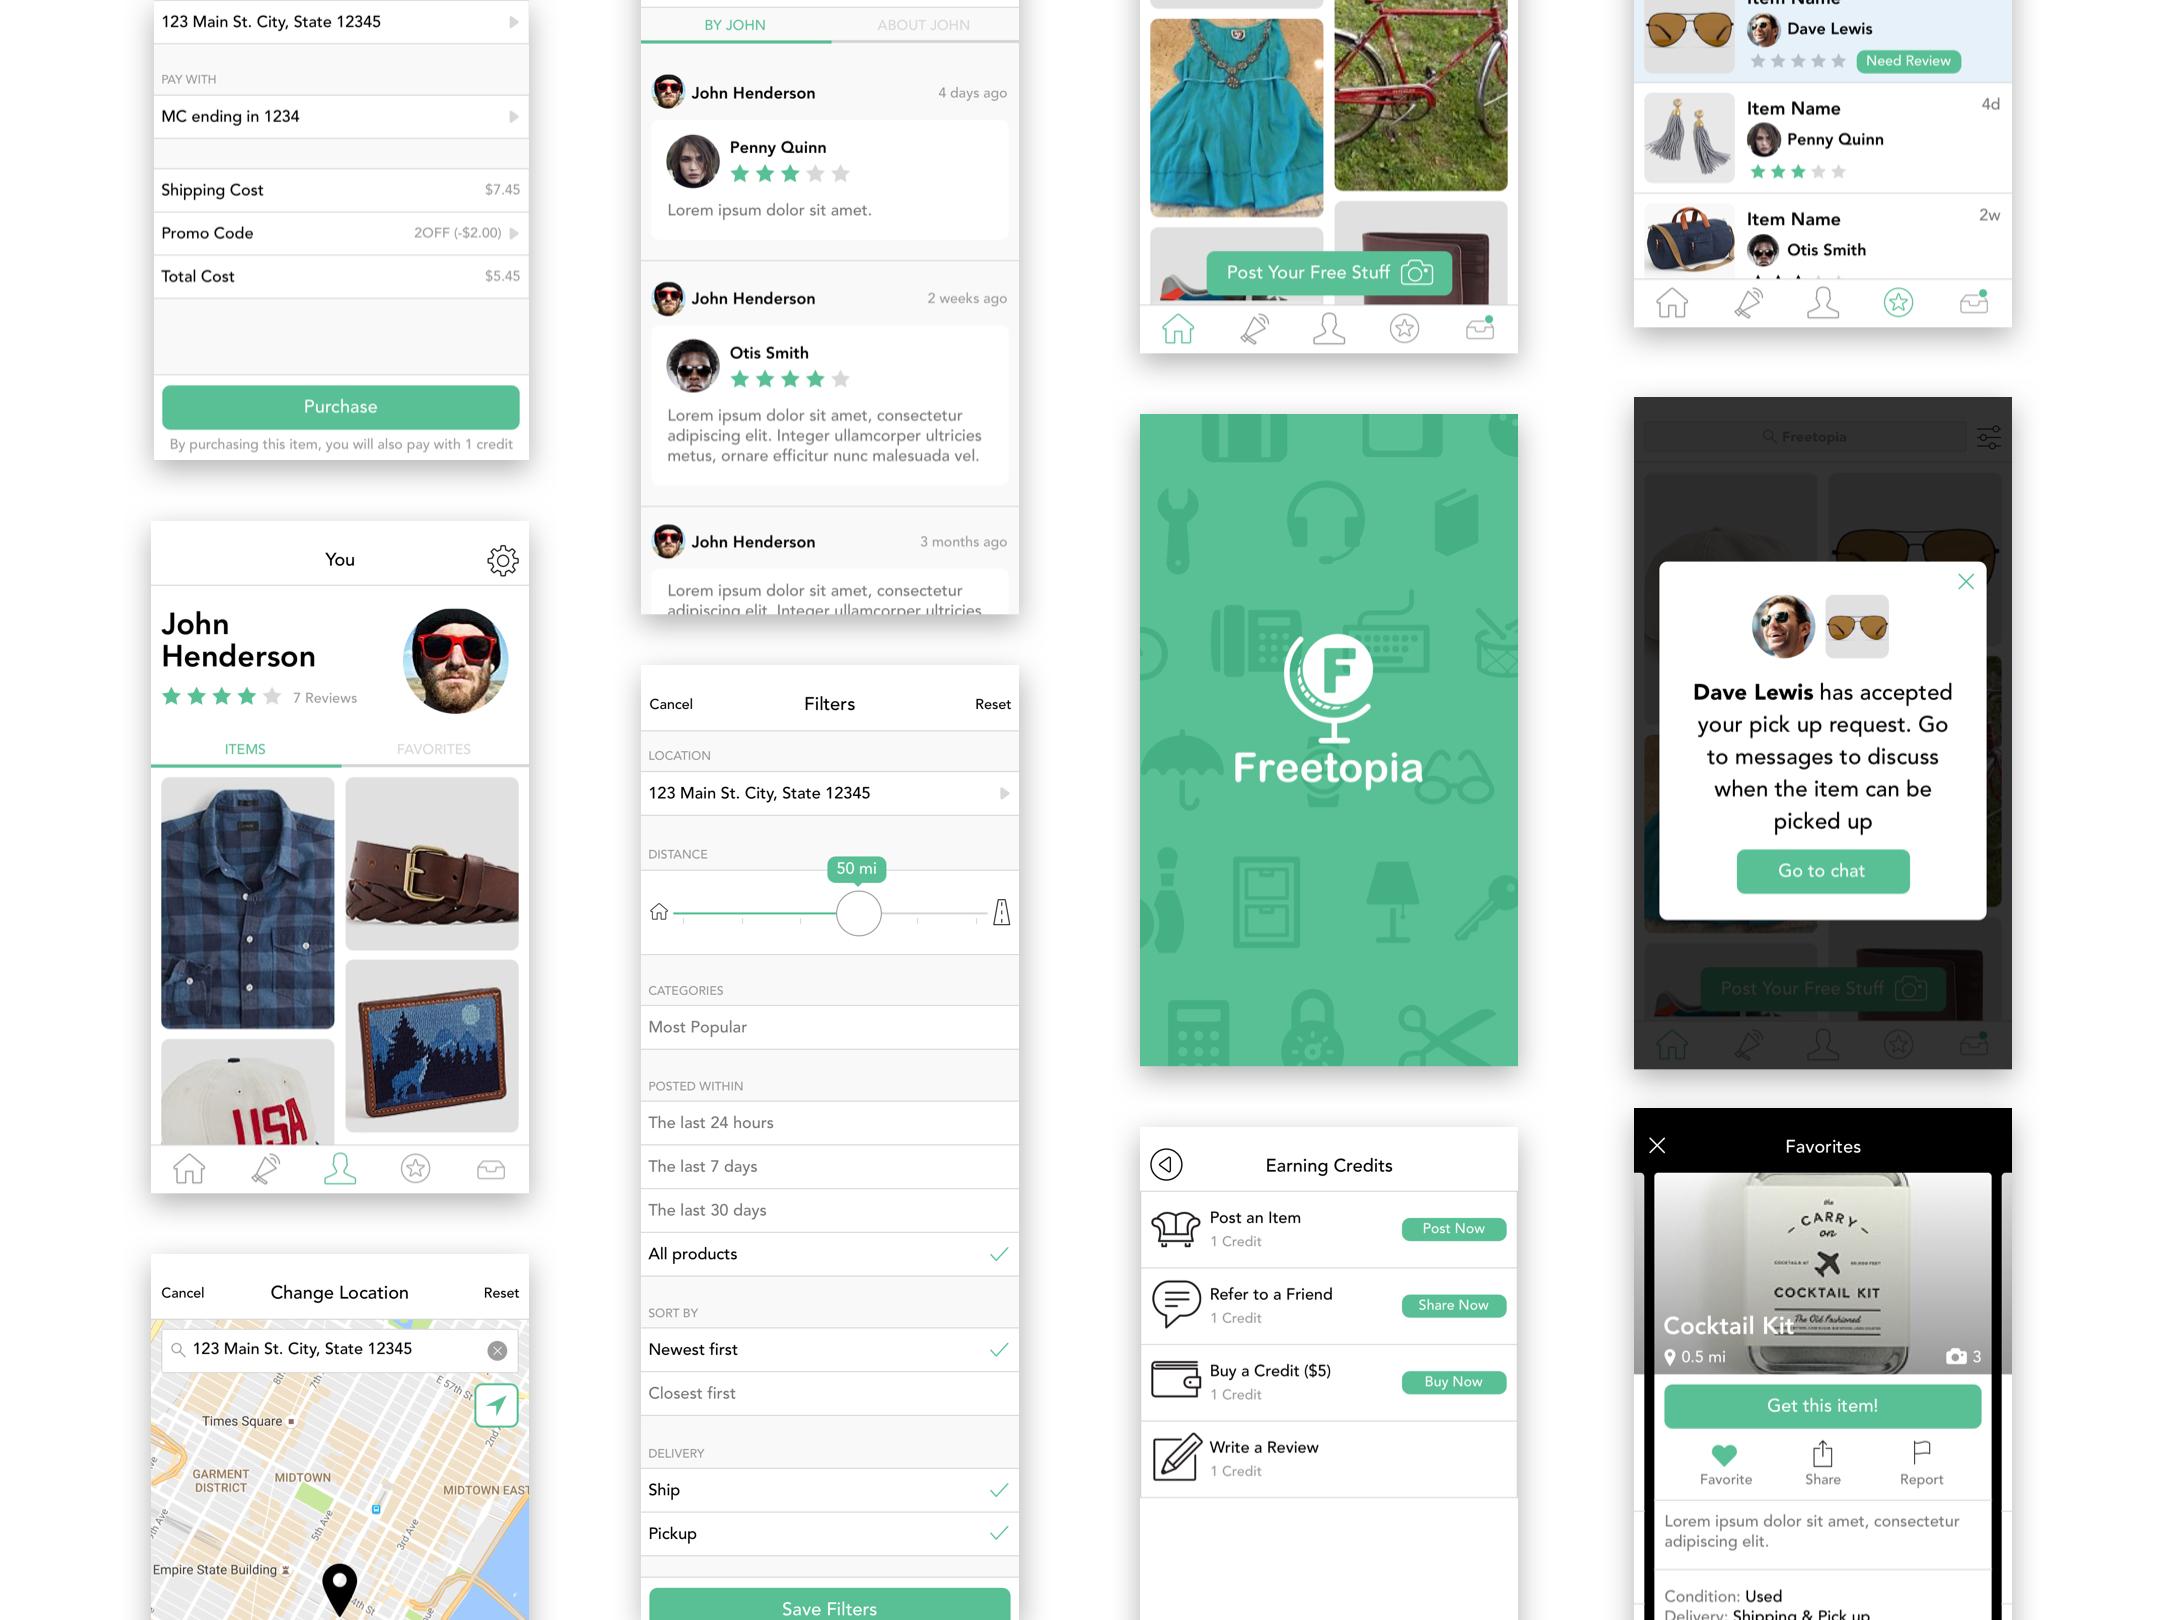 freetopia-iphone-screens.jpg